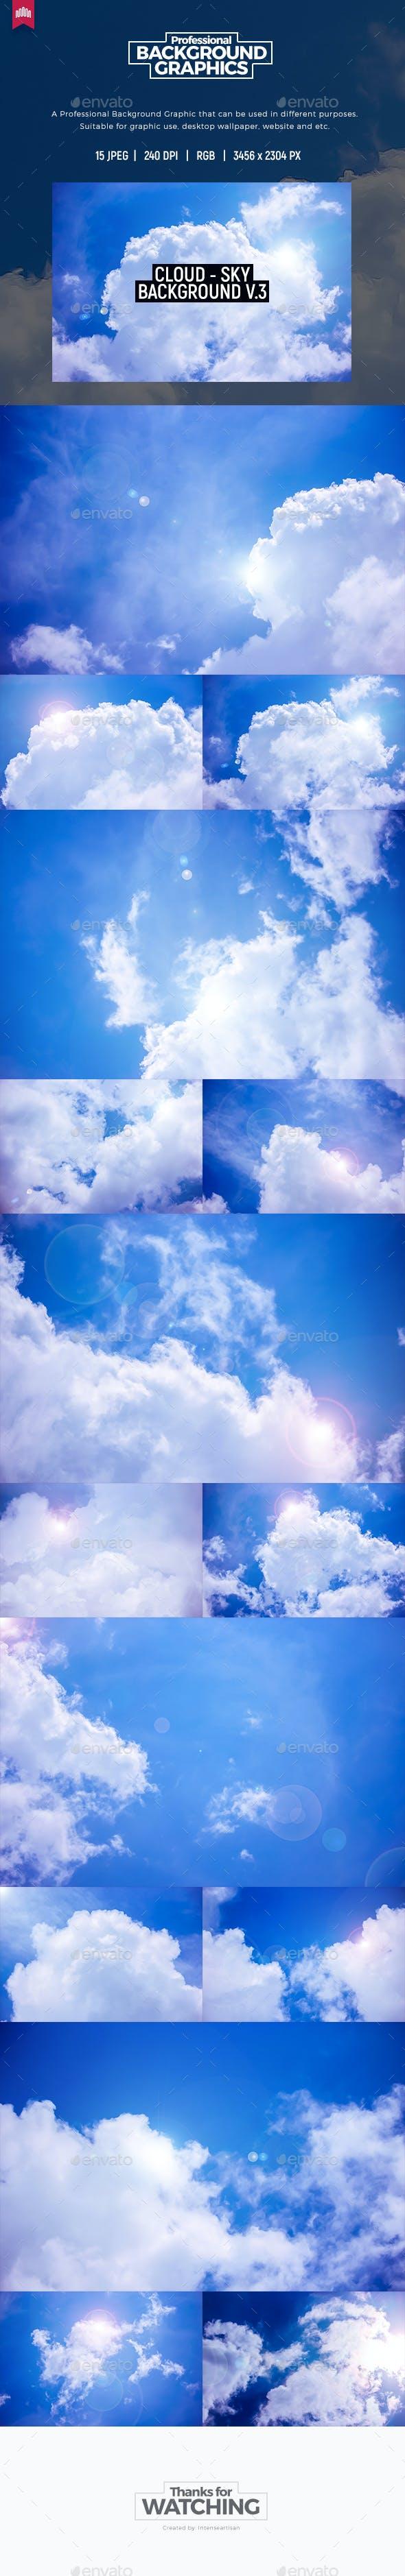 Cloud - Sky Background V.3